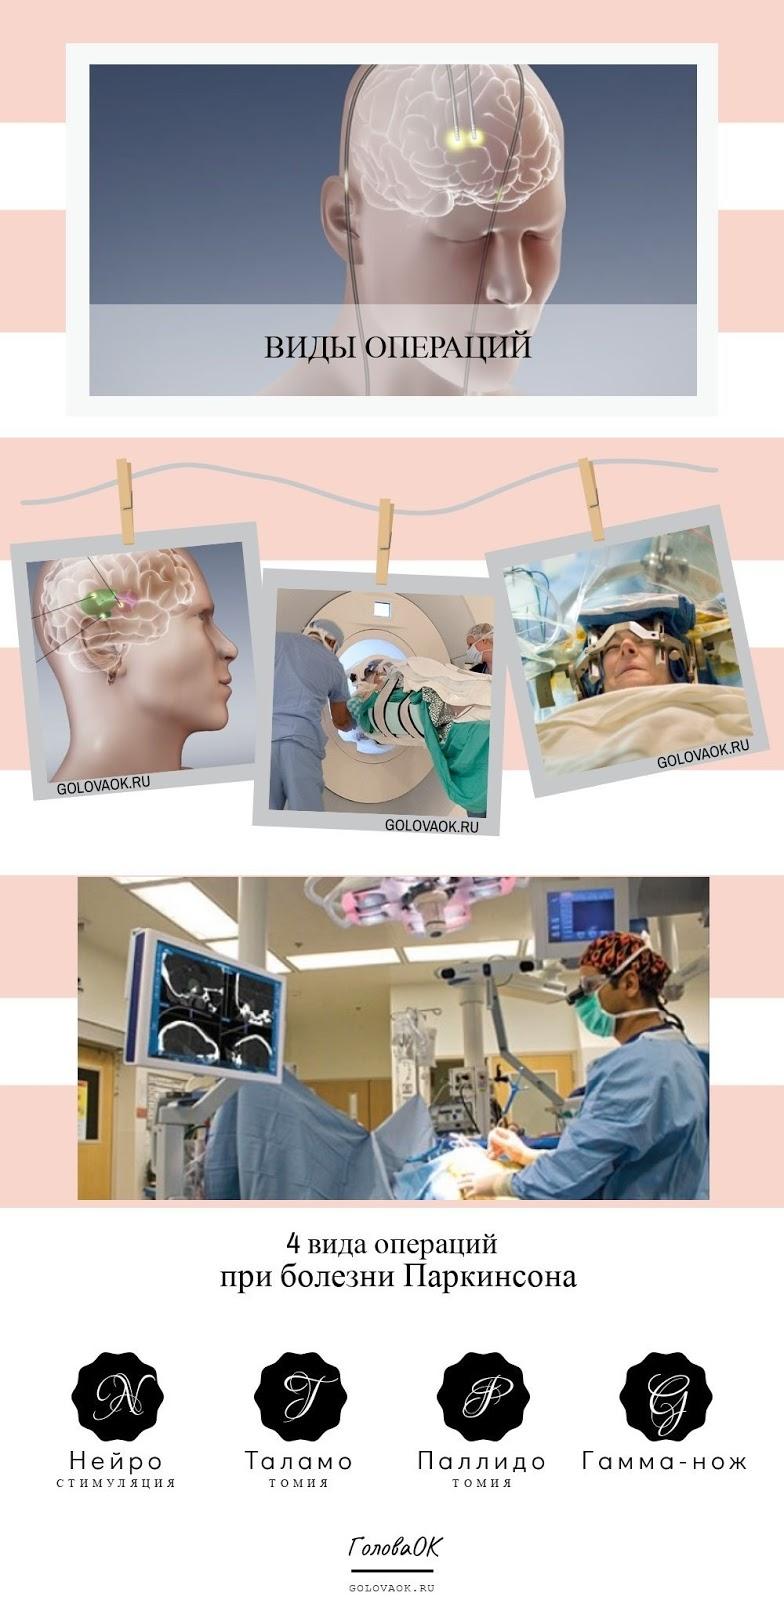 операция при болезни паркинсона